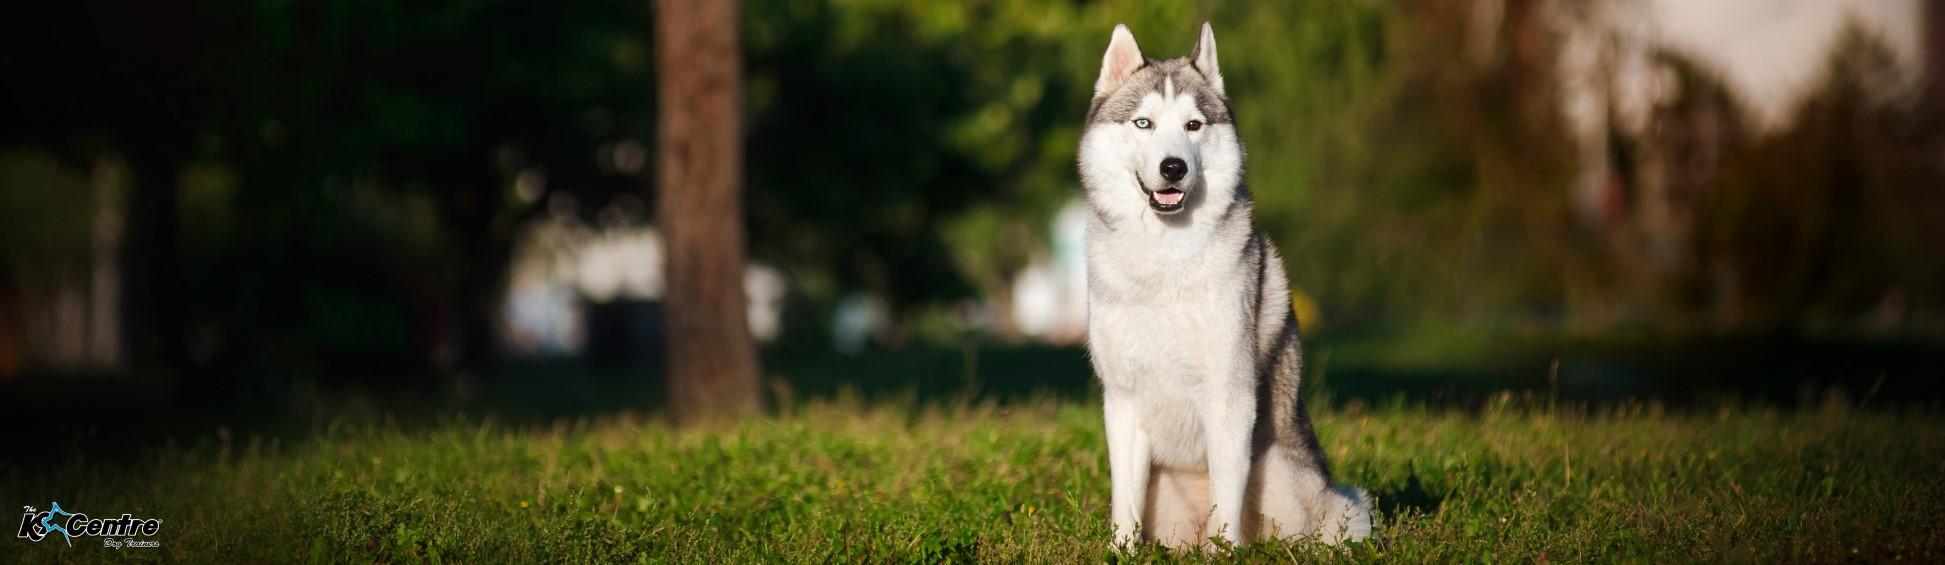 Dog Obedience Training Australia